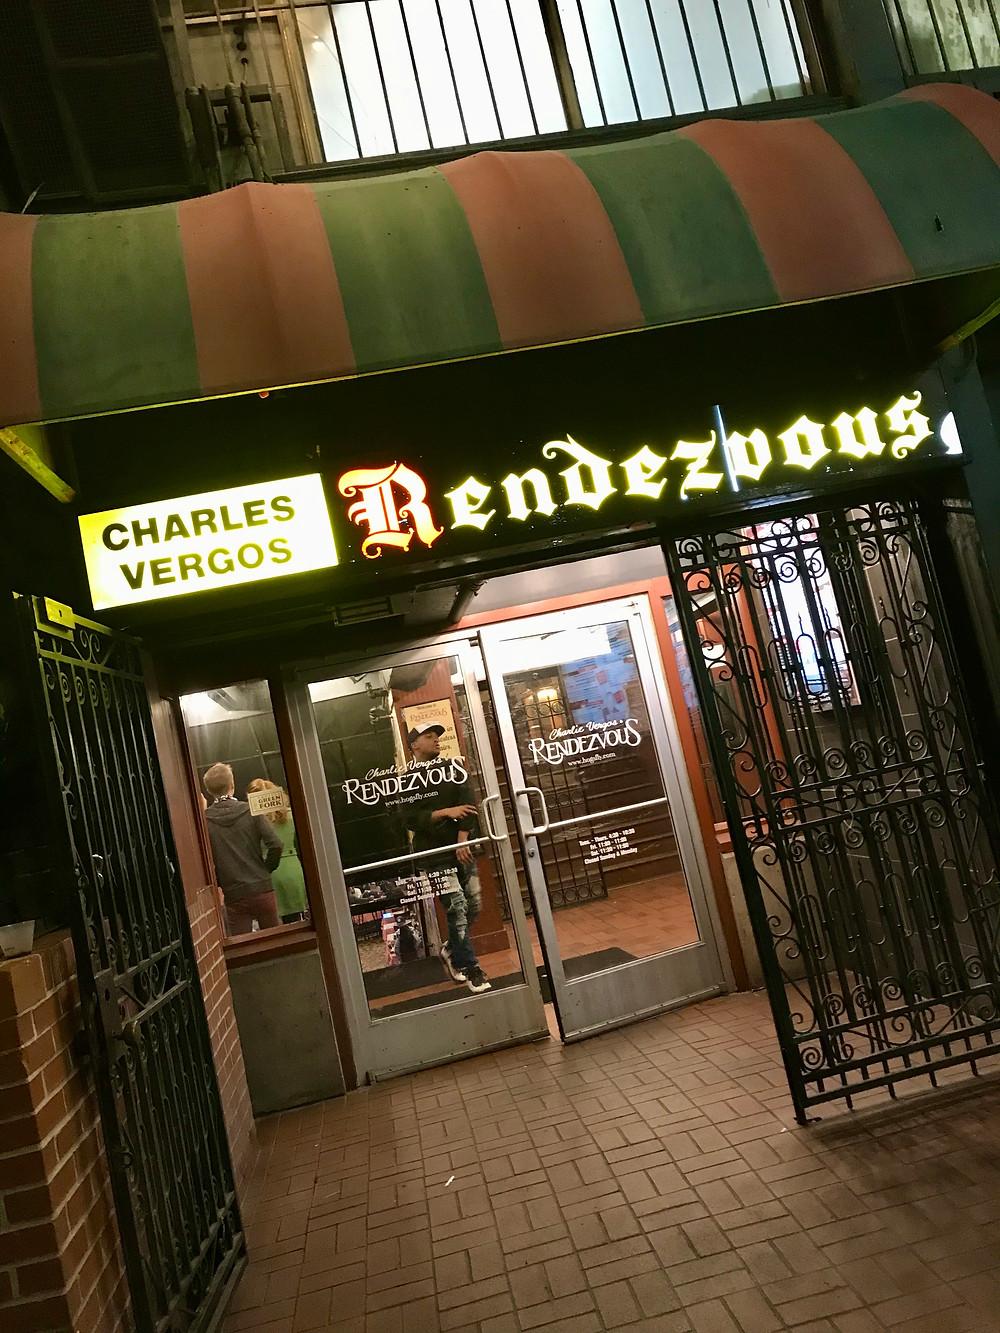 memphis-best-ribs-rendezvous